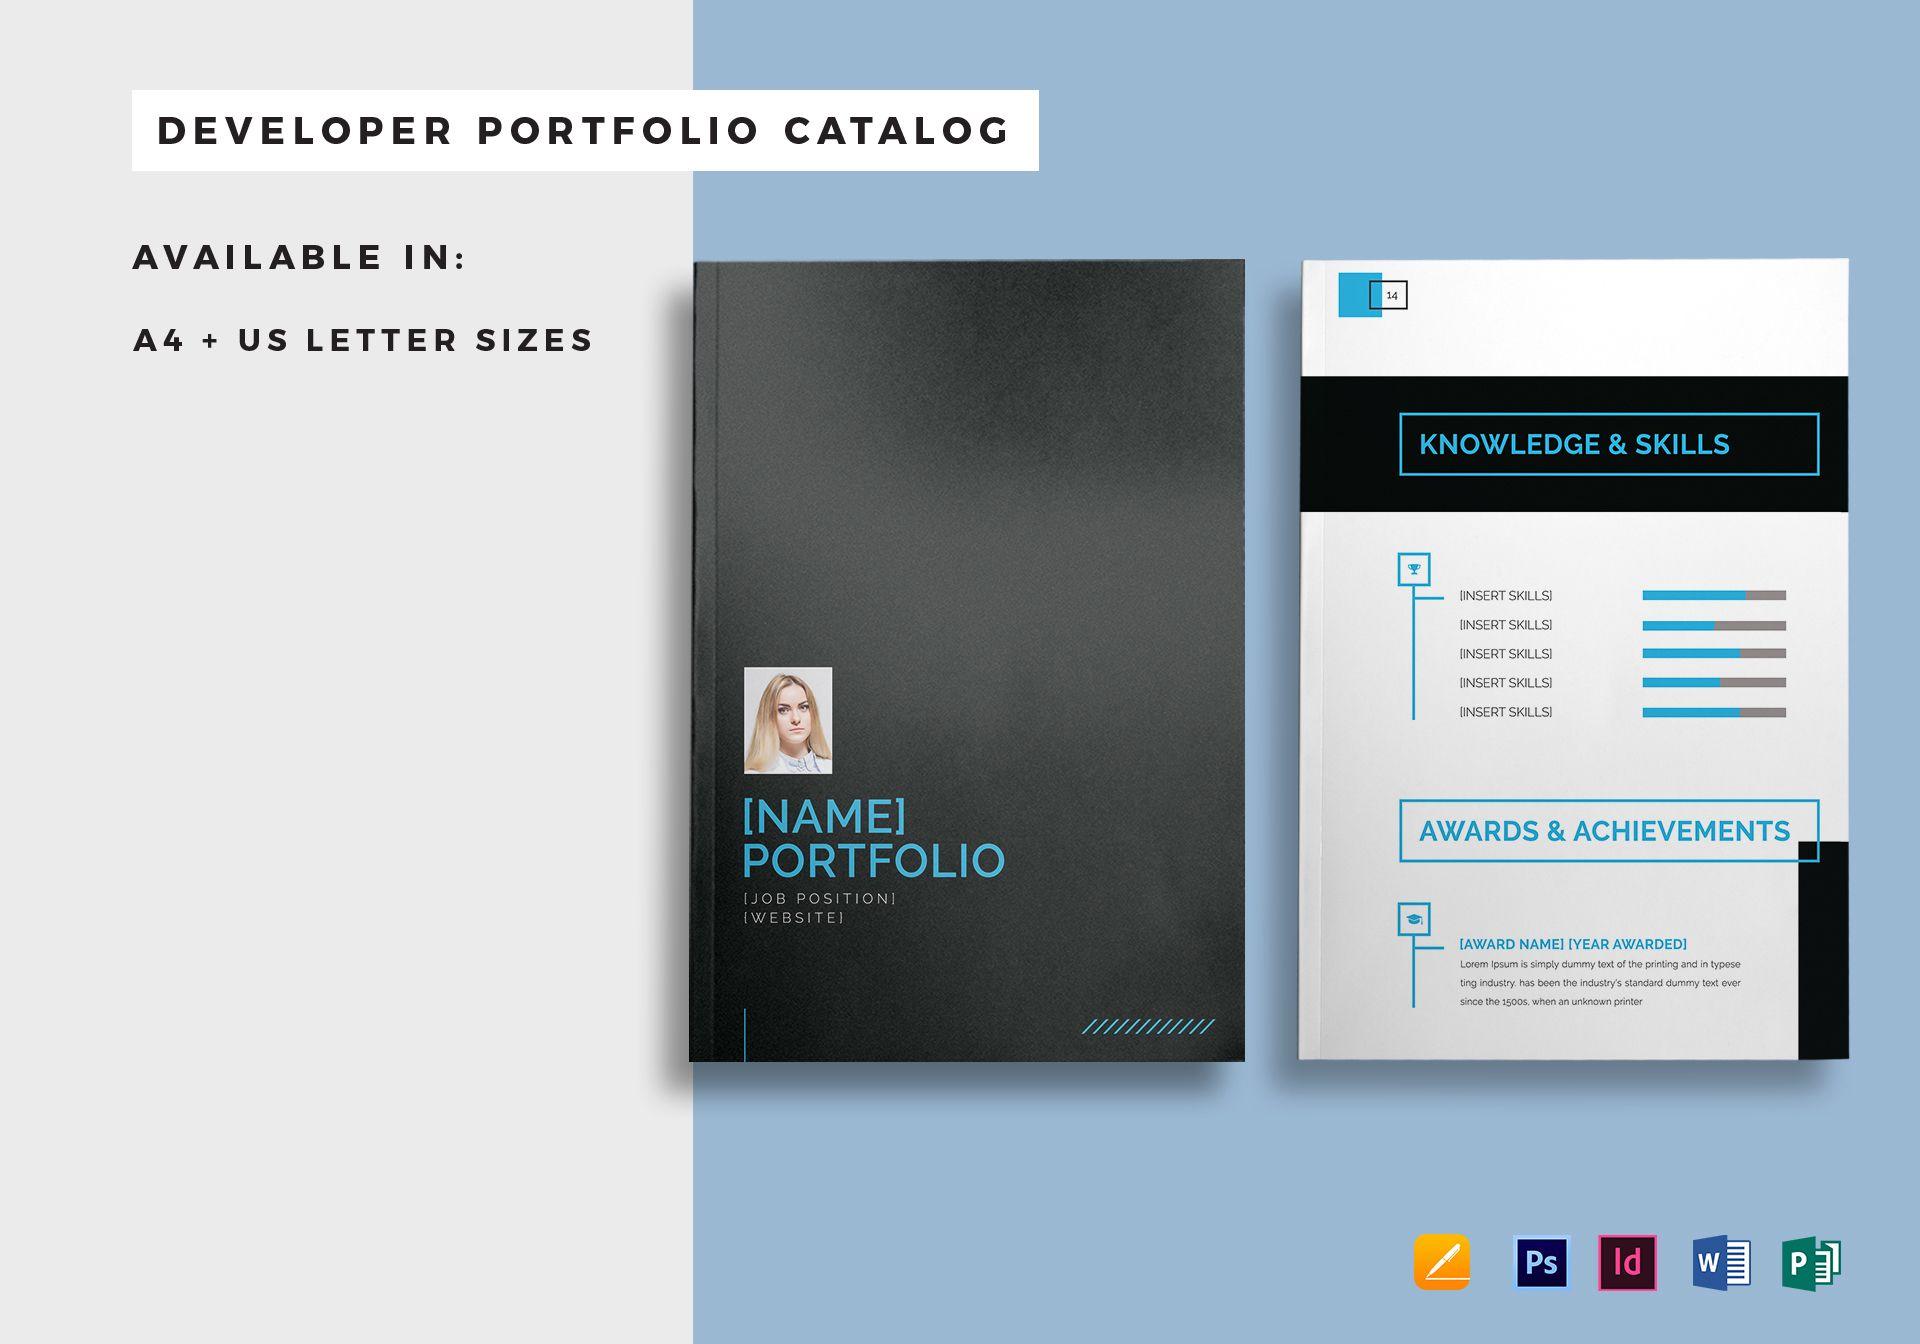 developer portfolio catalog